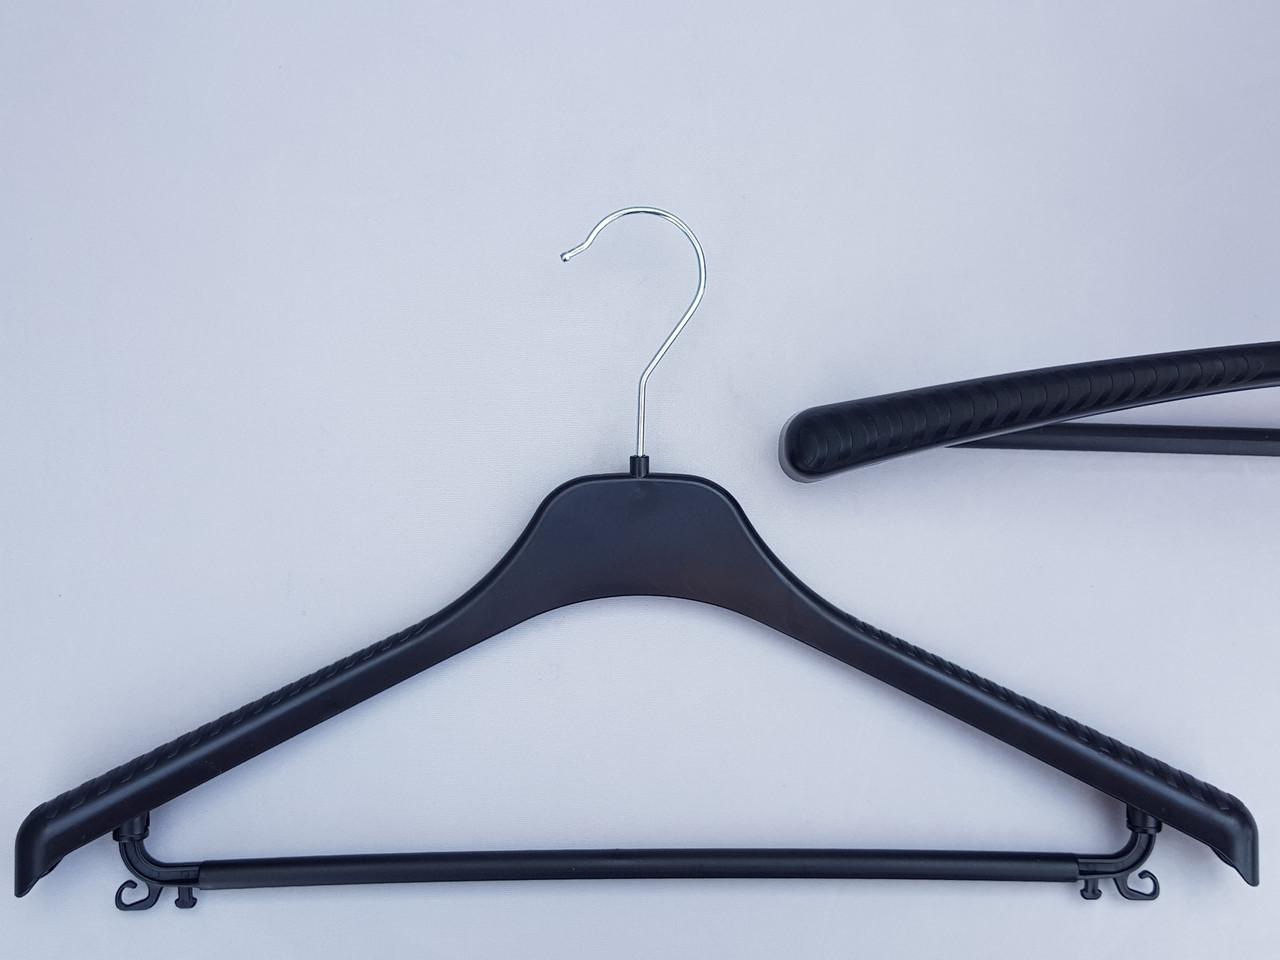 Плечики V-Tp42 черного цвета, длина 42 см